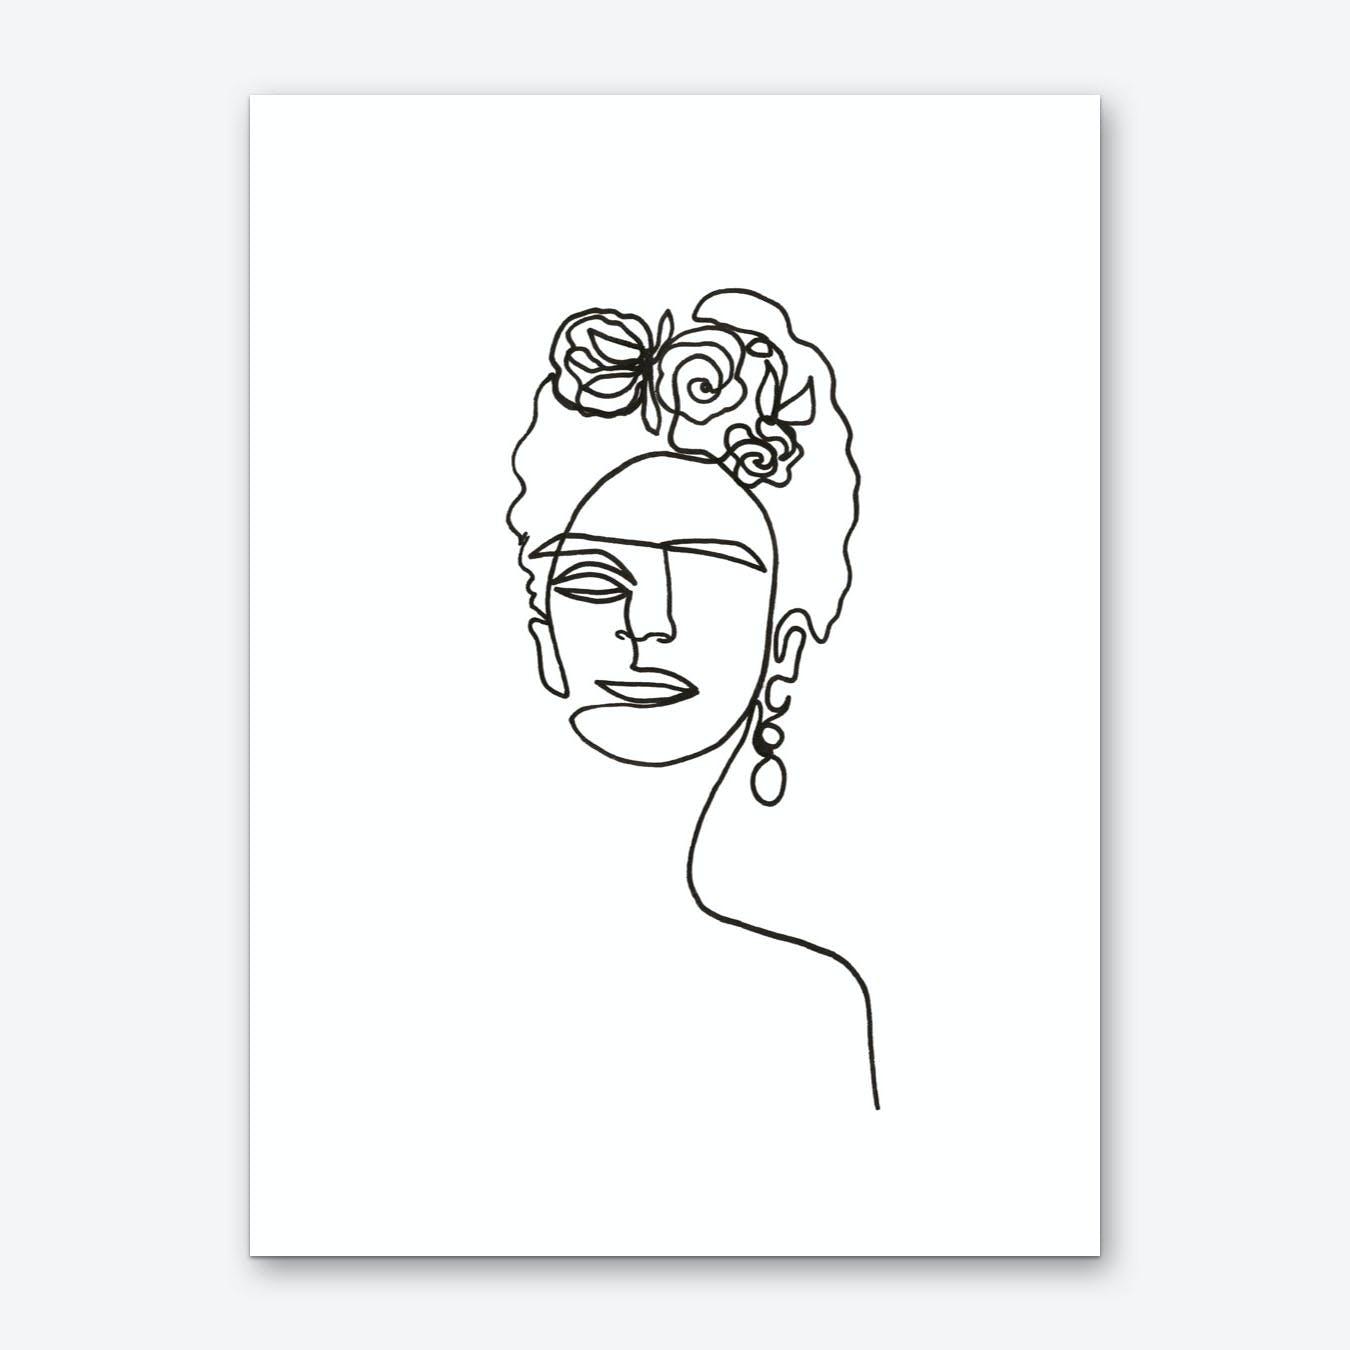 Canvas FRIDA KAHLO IMAGE PICTURE Art Print Poster